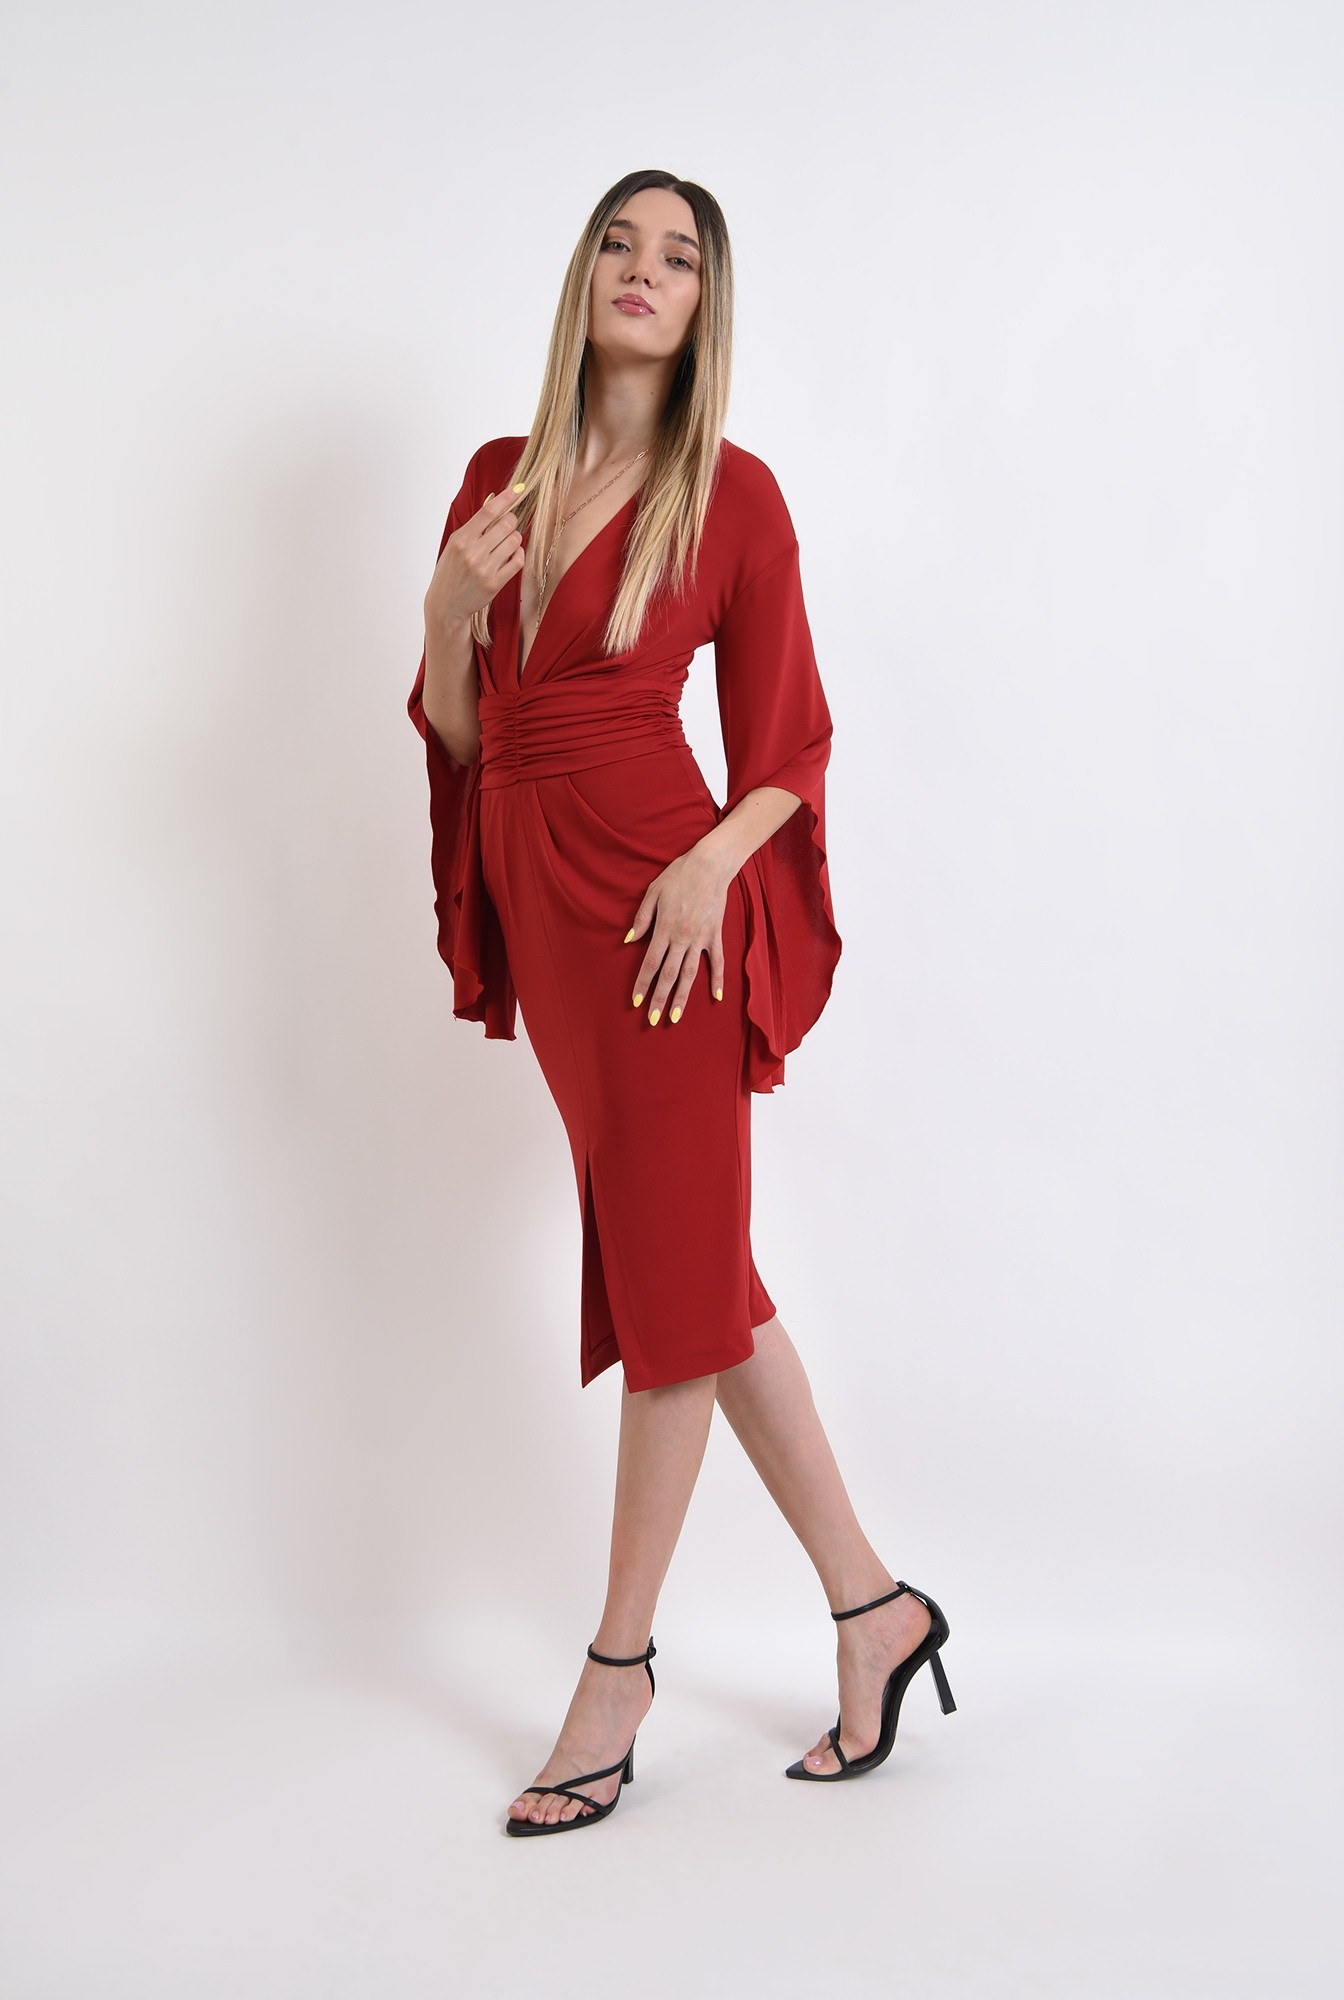 1 - rochie rosie, eleganta, cu maneci evazate